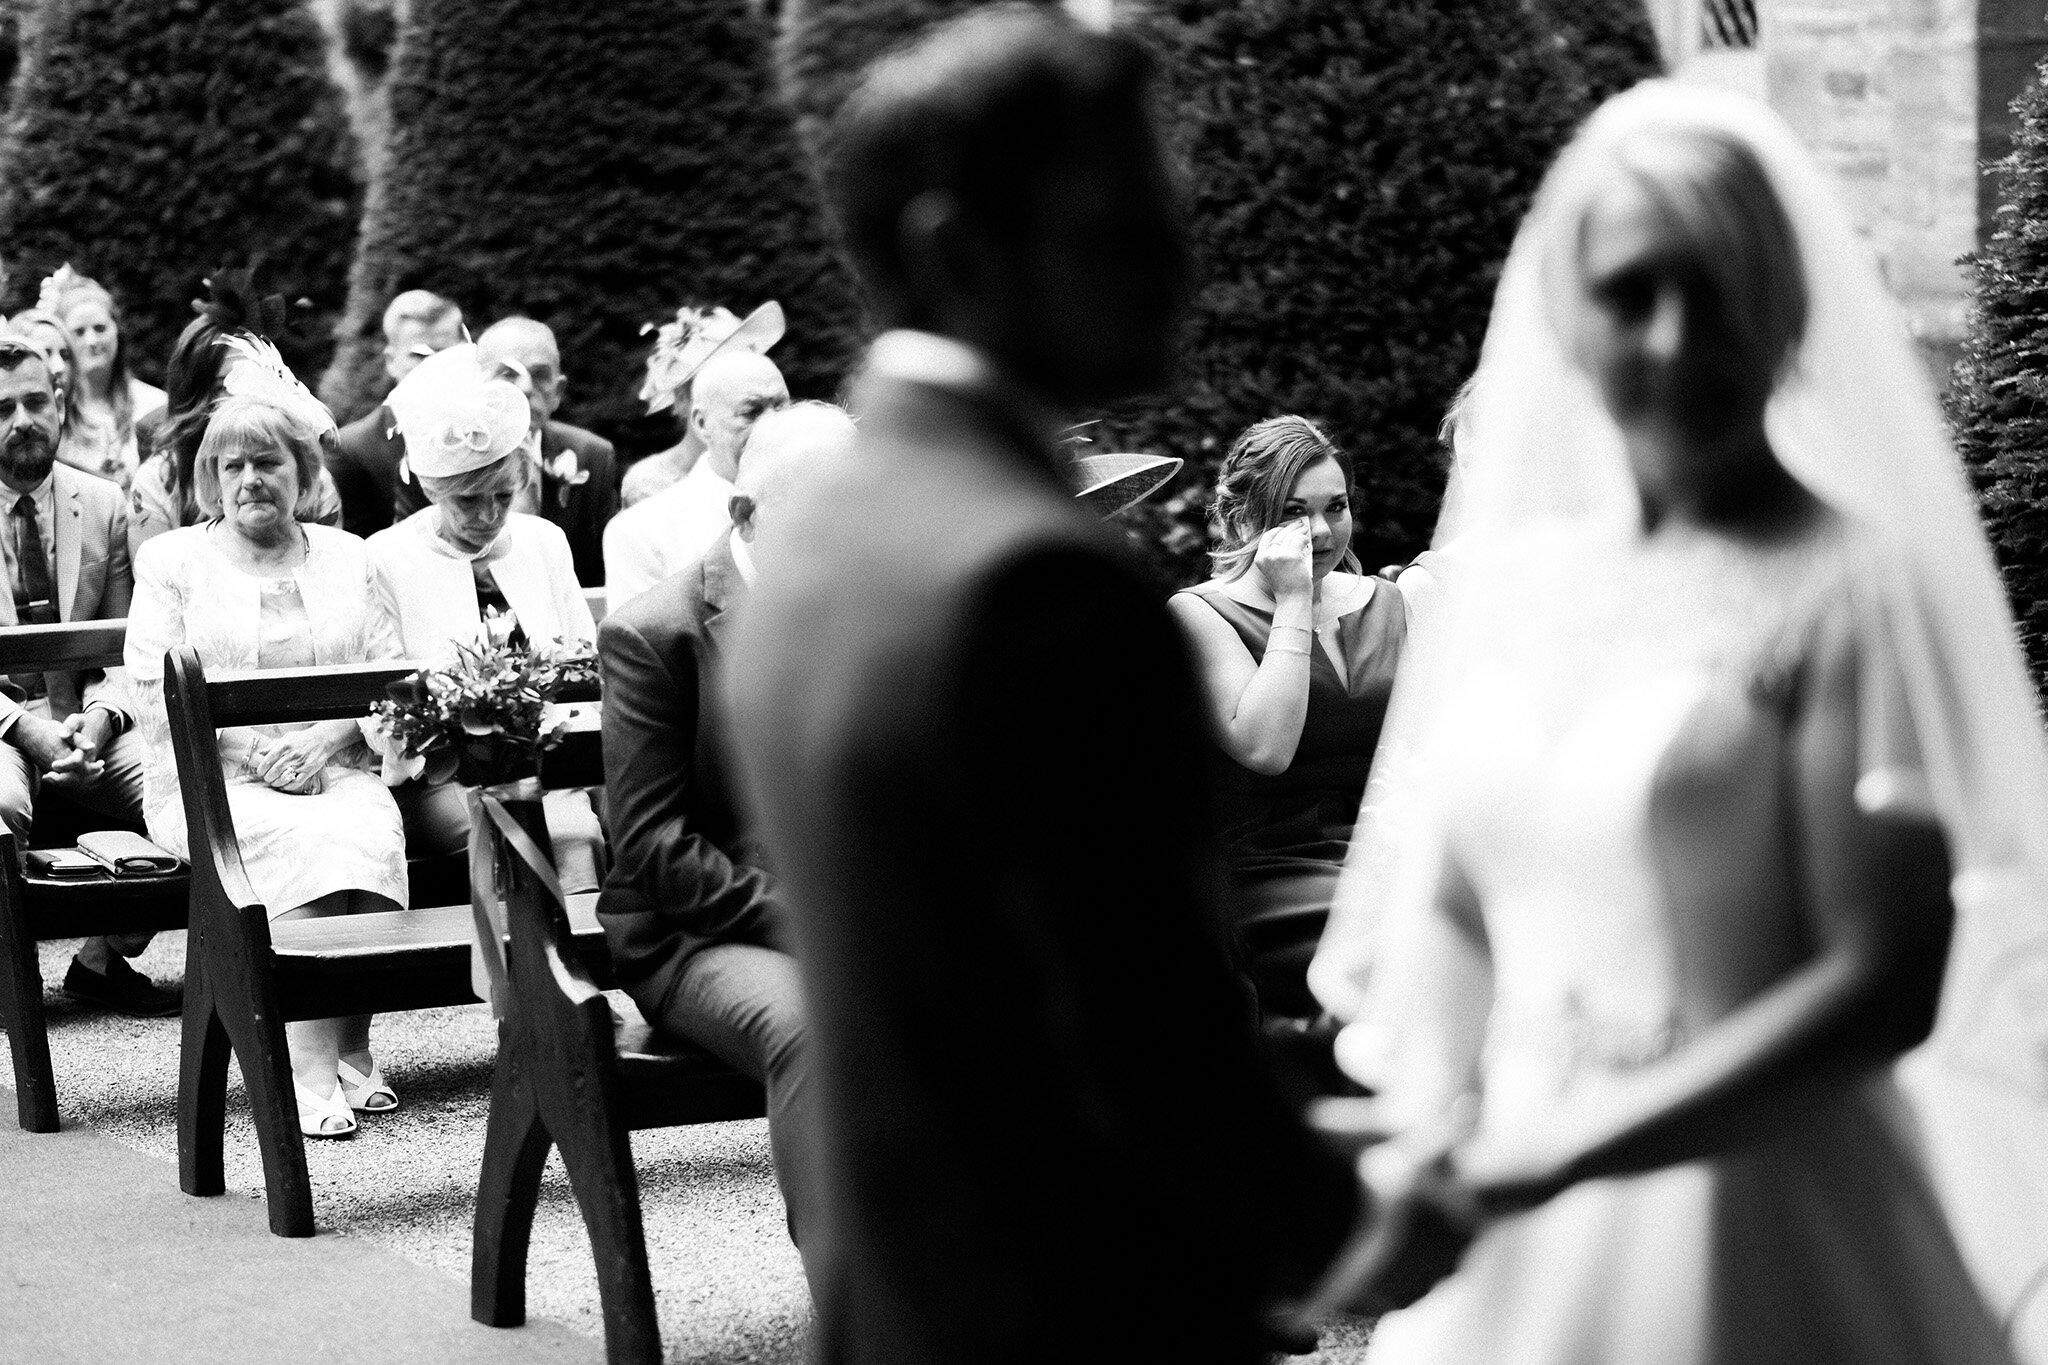 Scott-Stockwell-Photography-wedding-photographer-hampton-court-castle-crying.jpg